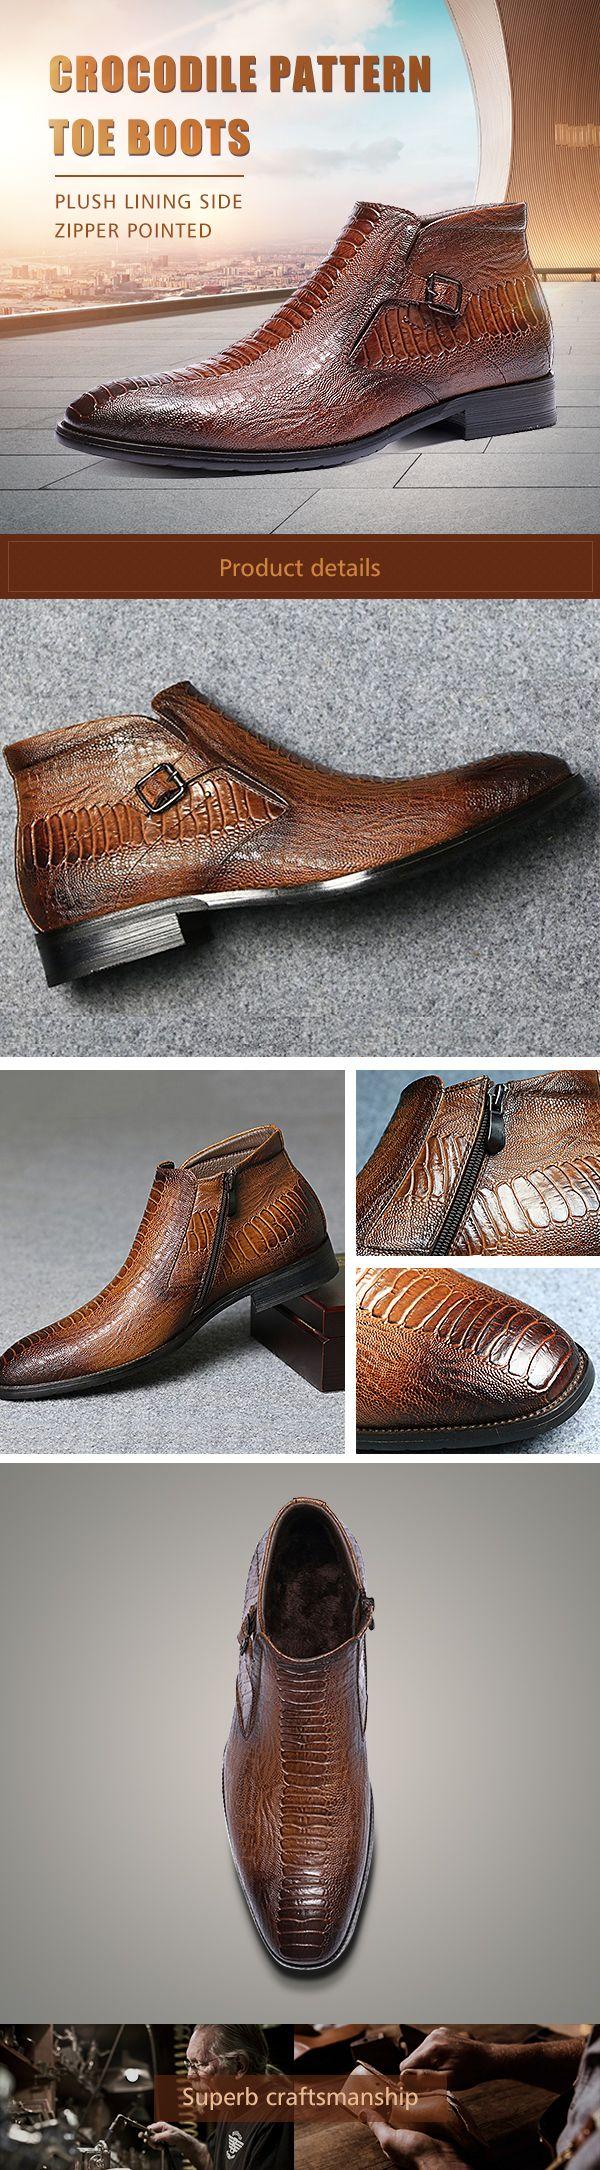 US$43.65 Large Size Men Crocodile Pattern Plush Lining Side Zipper Pointed Toe Boots